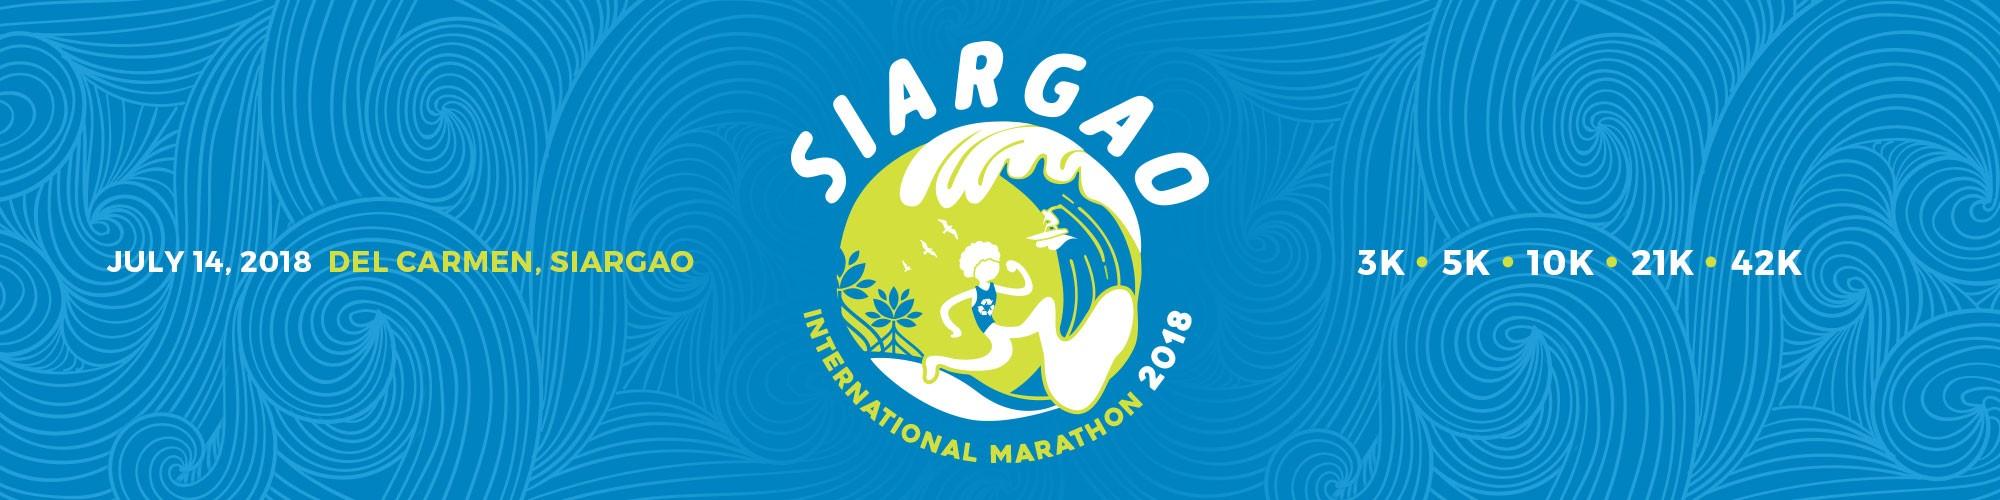 Siargao International Marathon